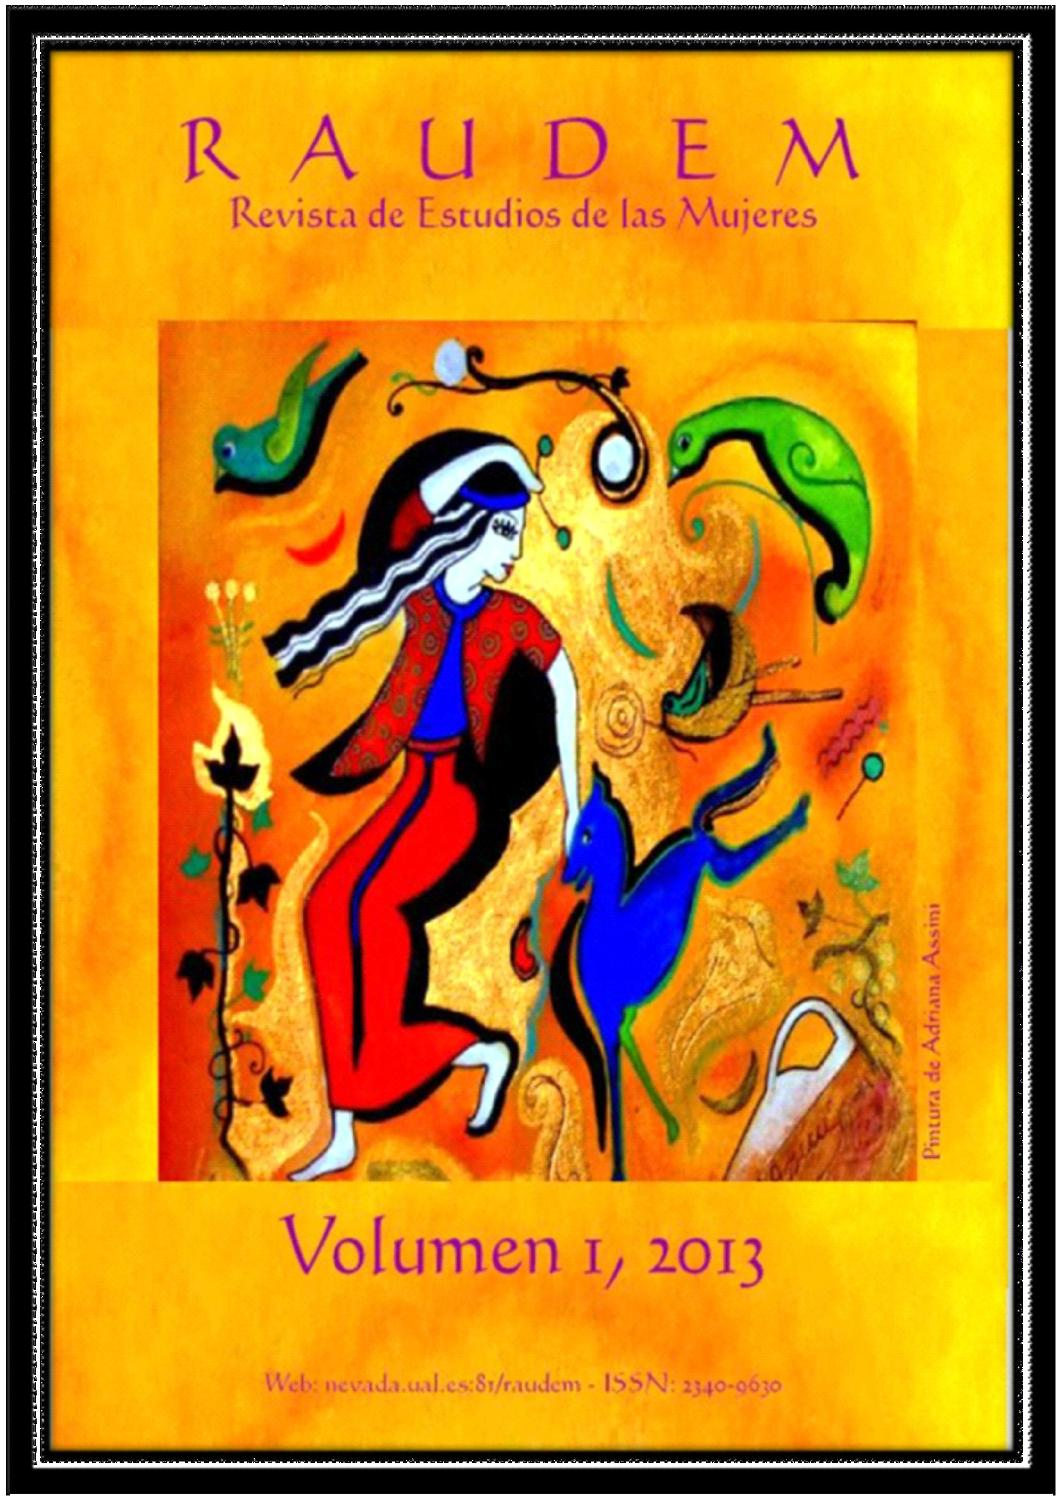 Raudem 01 2013 by RAUDEM, Revista de estudios de las mujeres - issuu